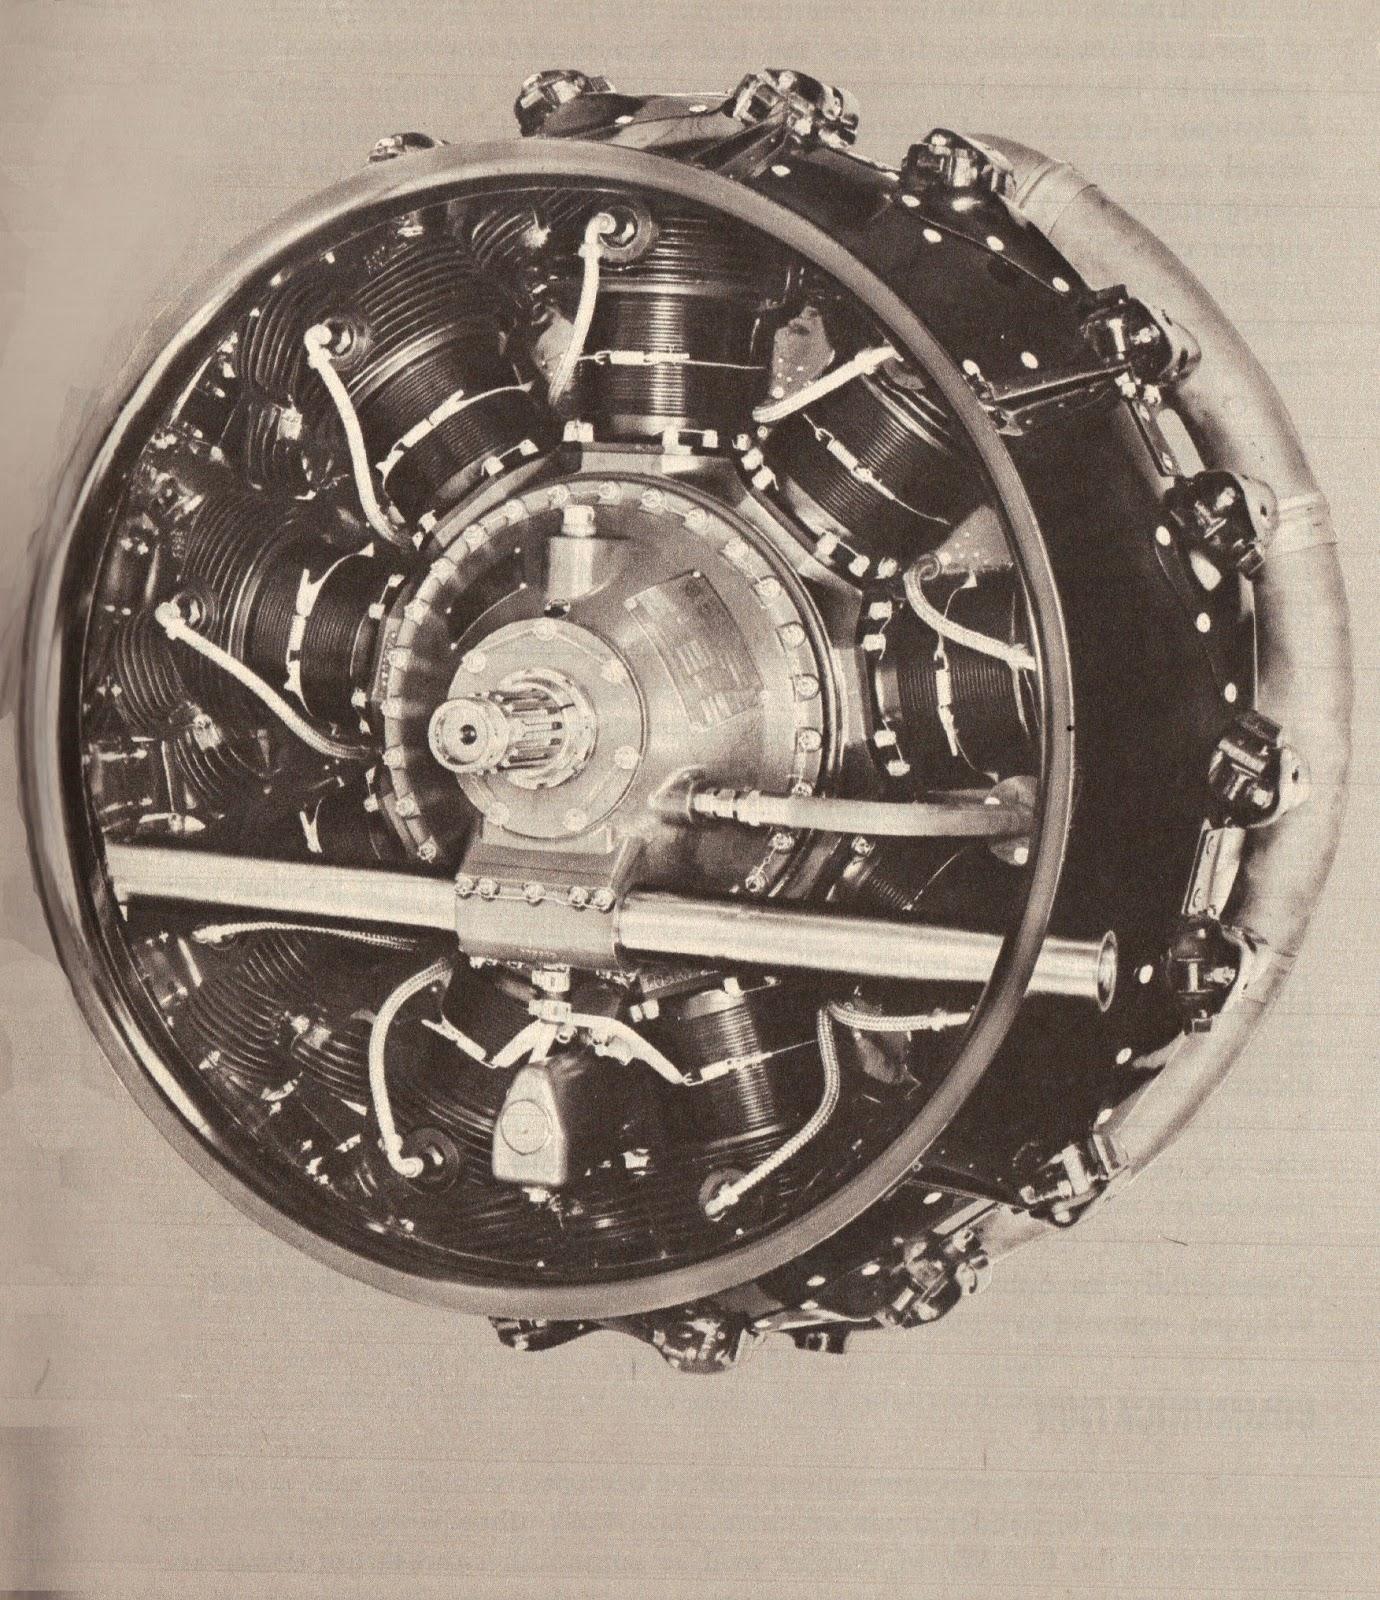 Progress is fine, but it's gone on for too long : WW2 Radial